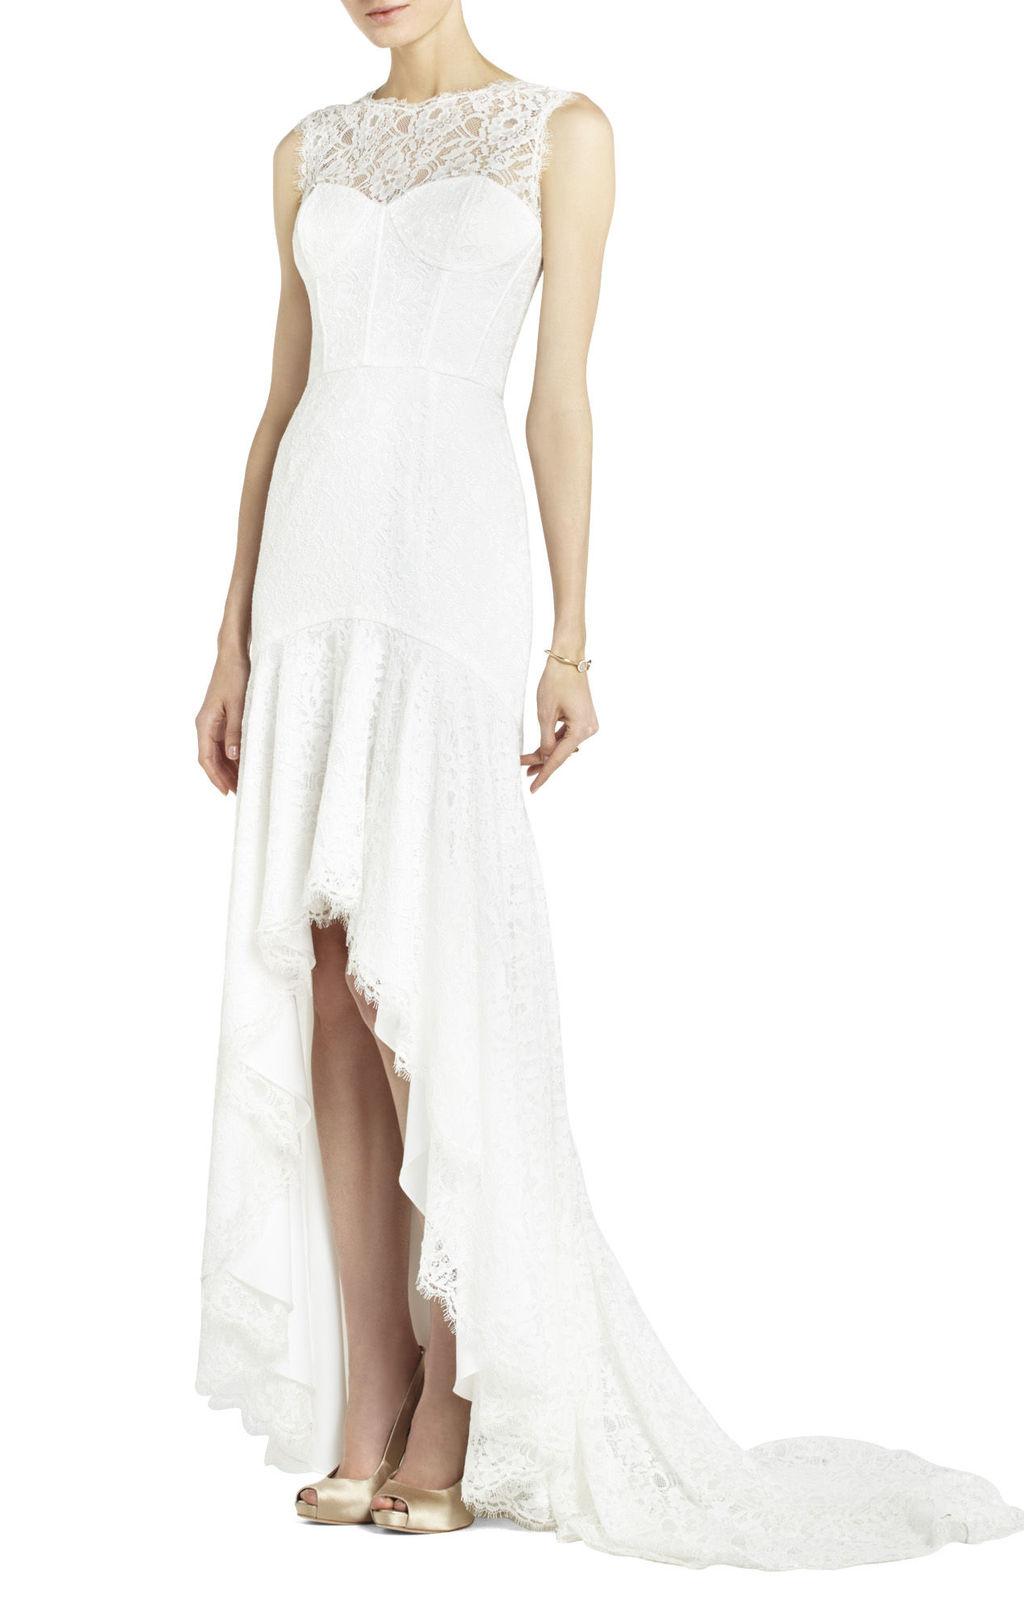 Bcbg-wedding-dress-max-azria-bridal-clarissa.full